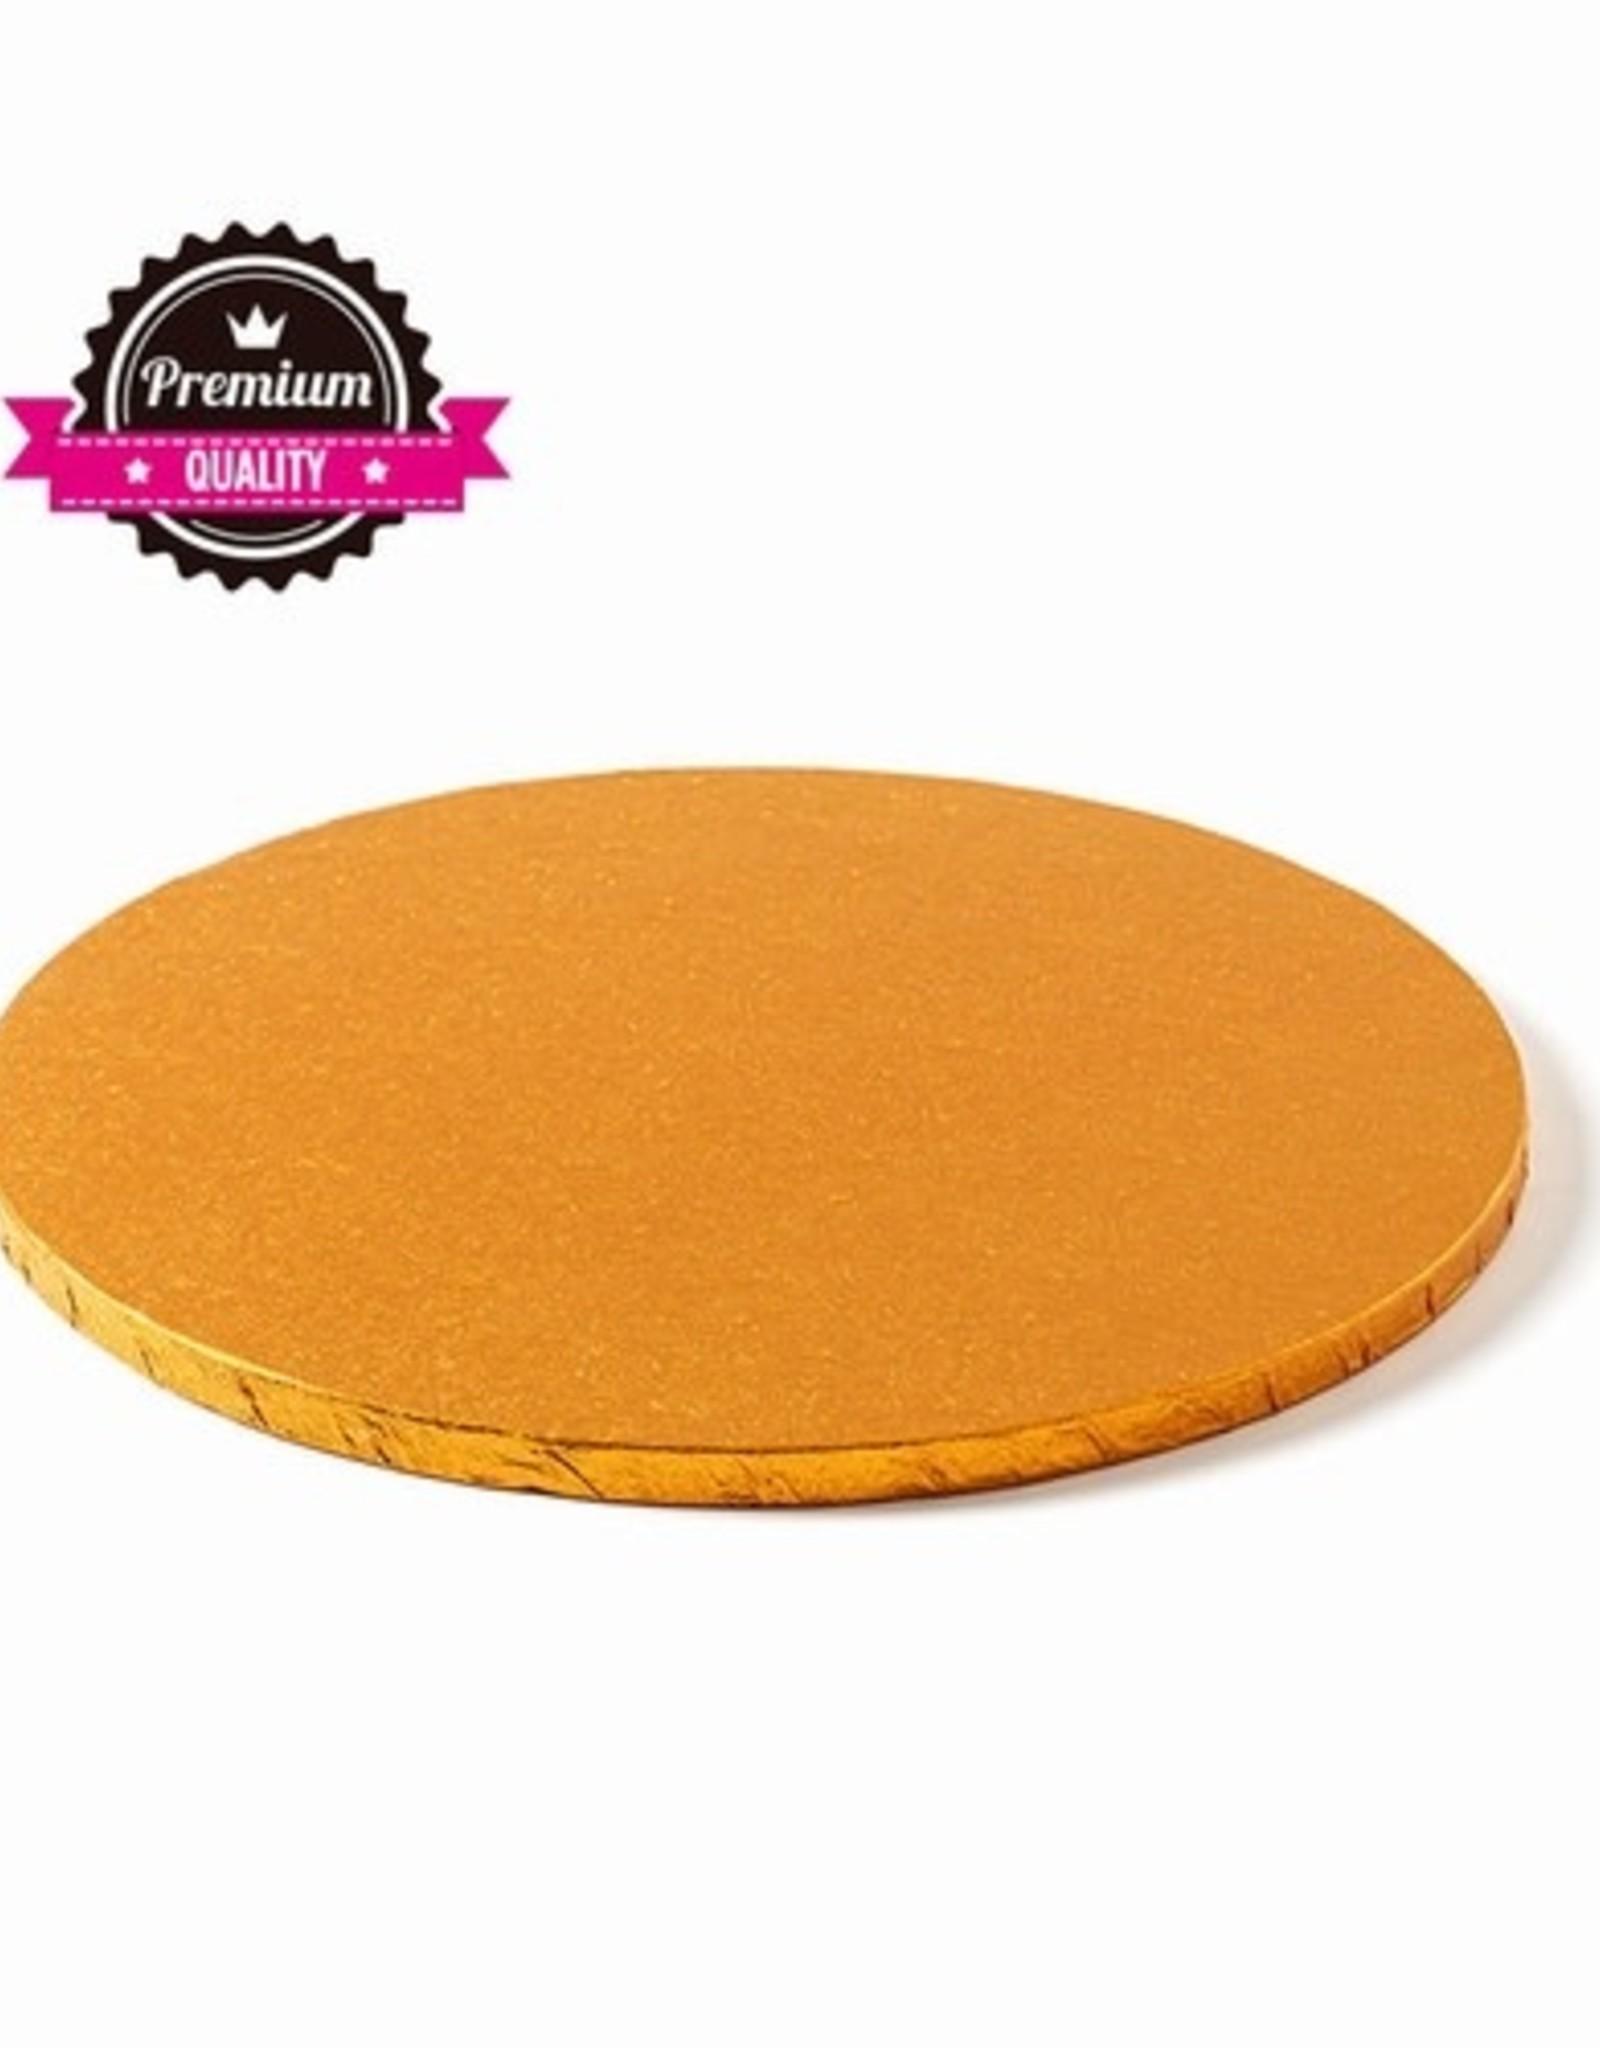 Cake Drum Rond Ø30,5cm Oranje